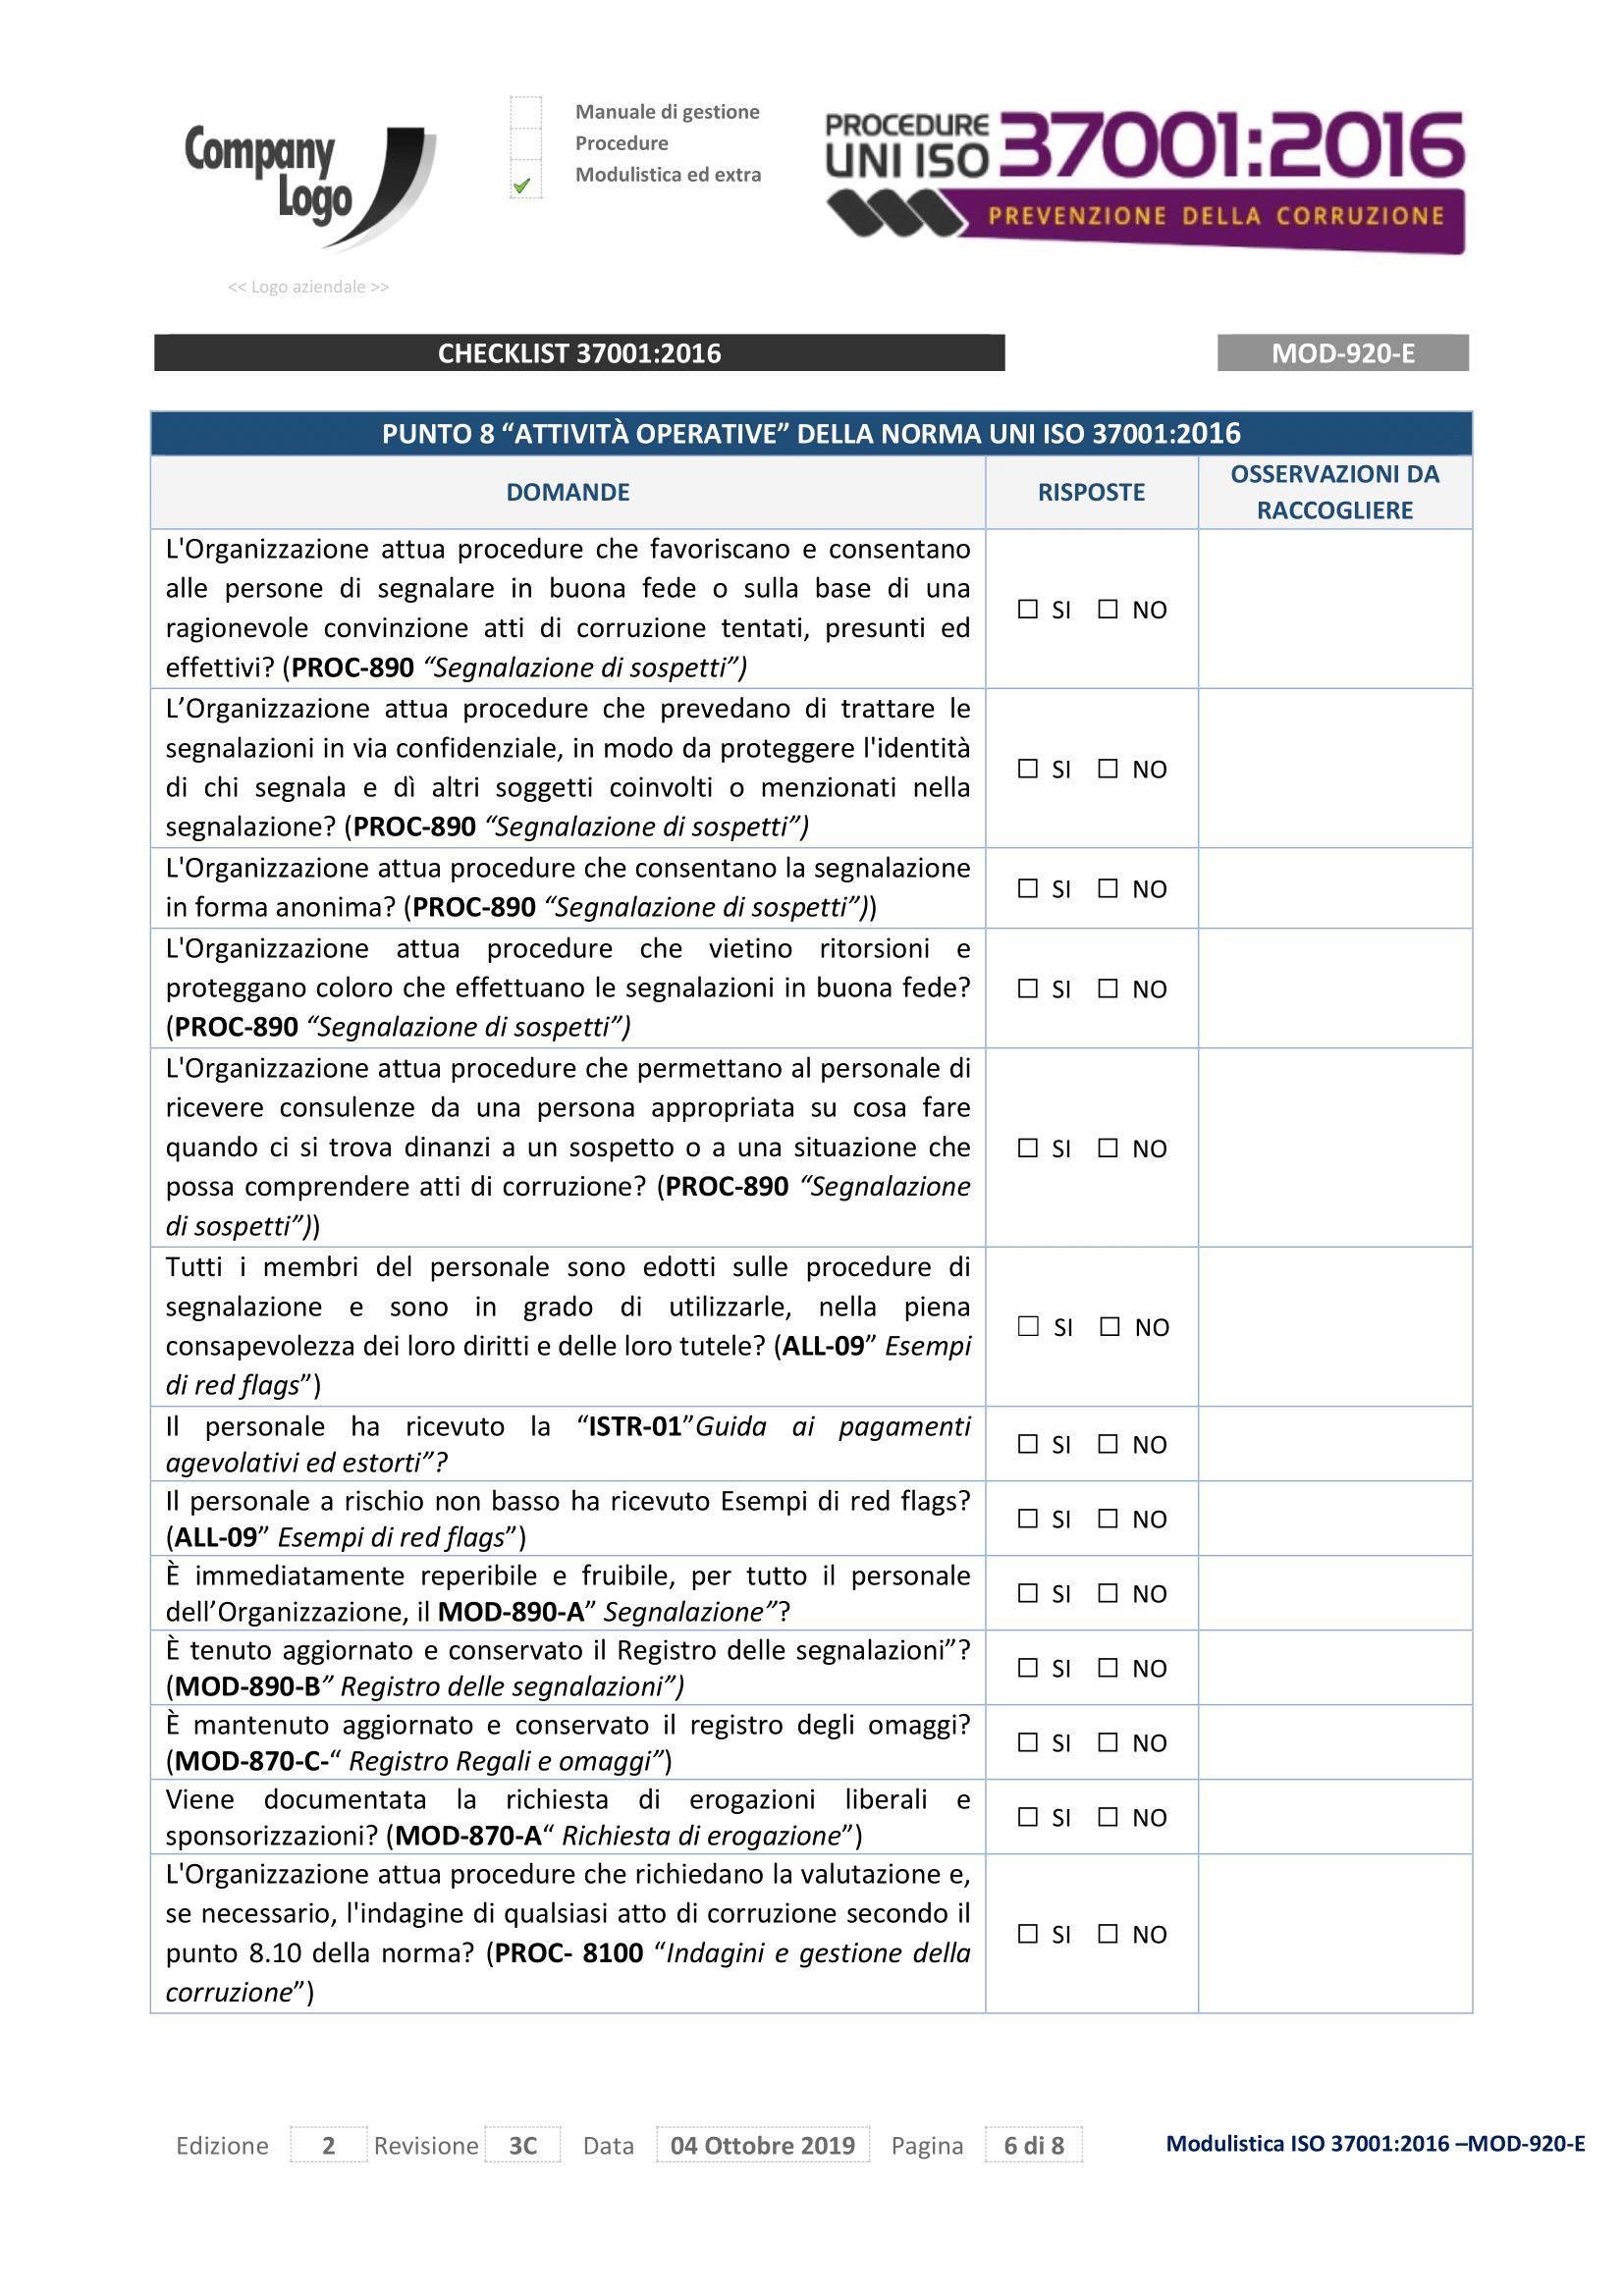 16.check-list-37001